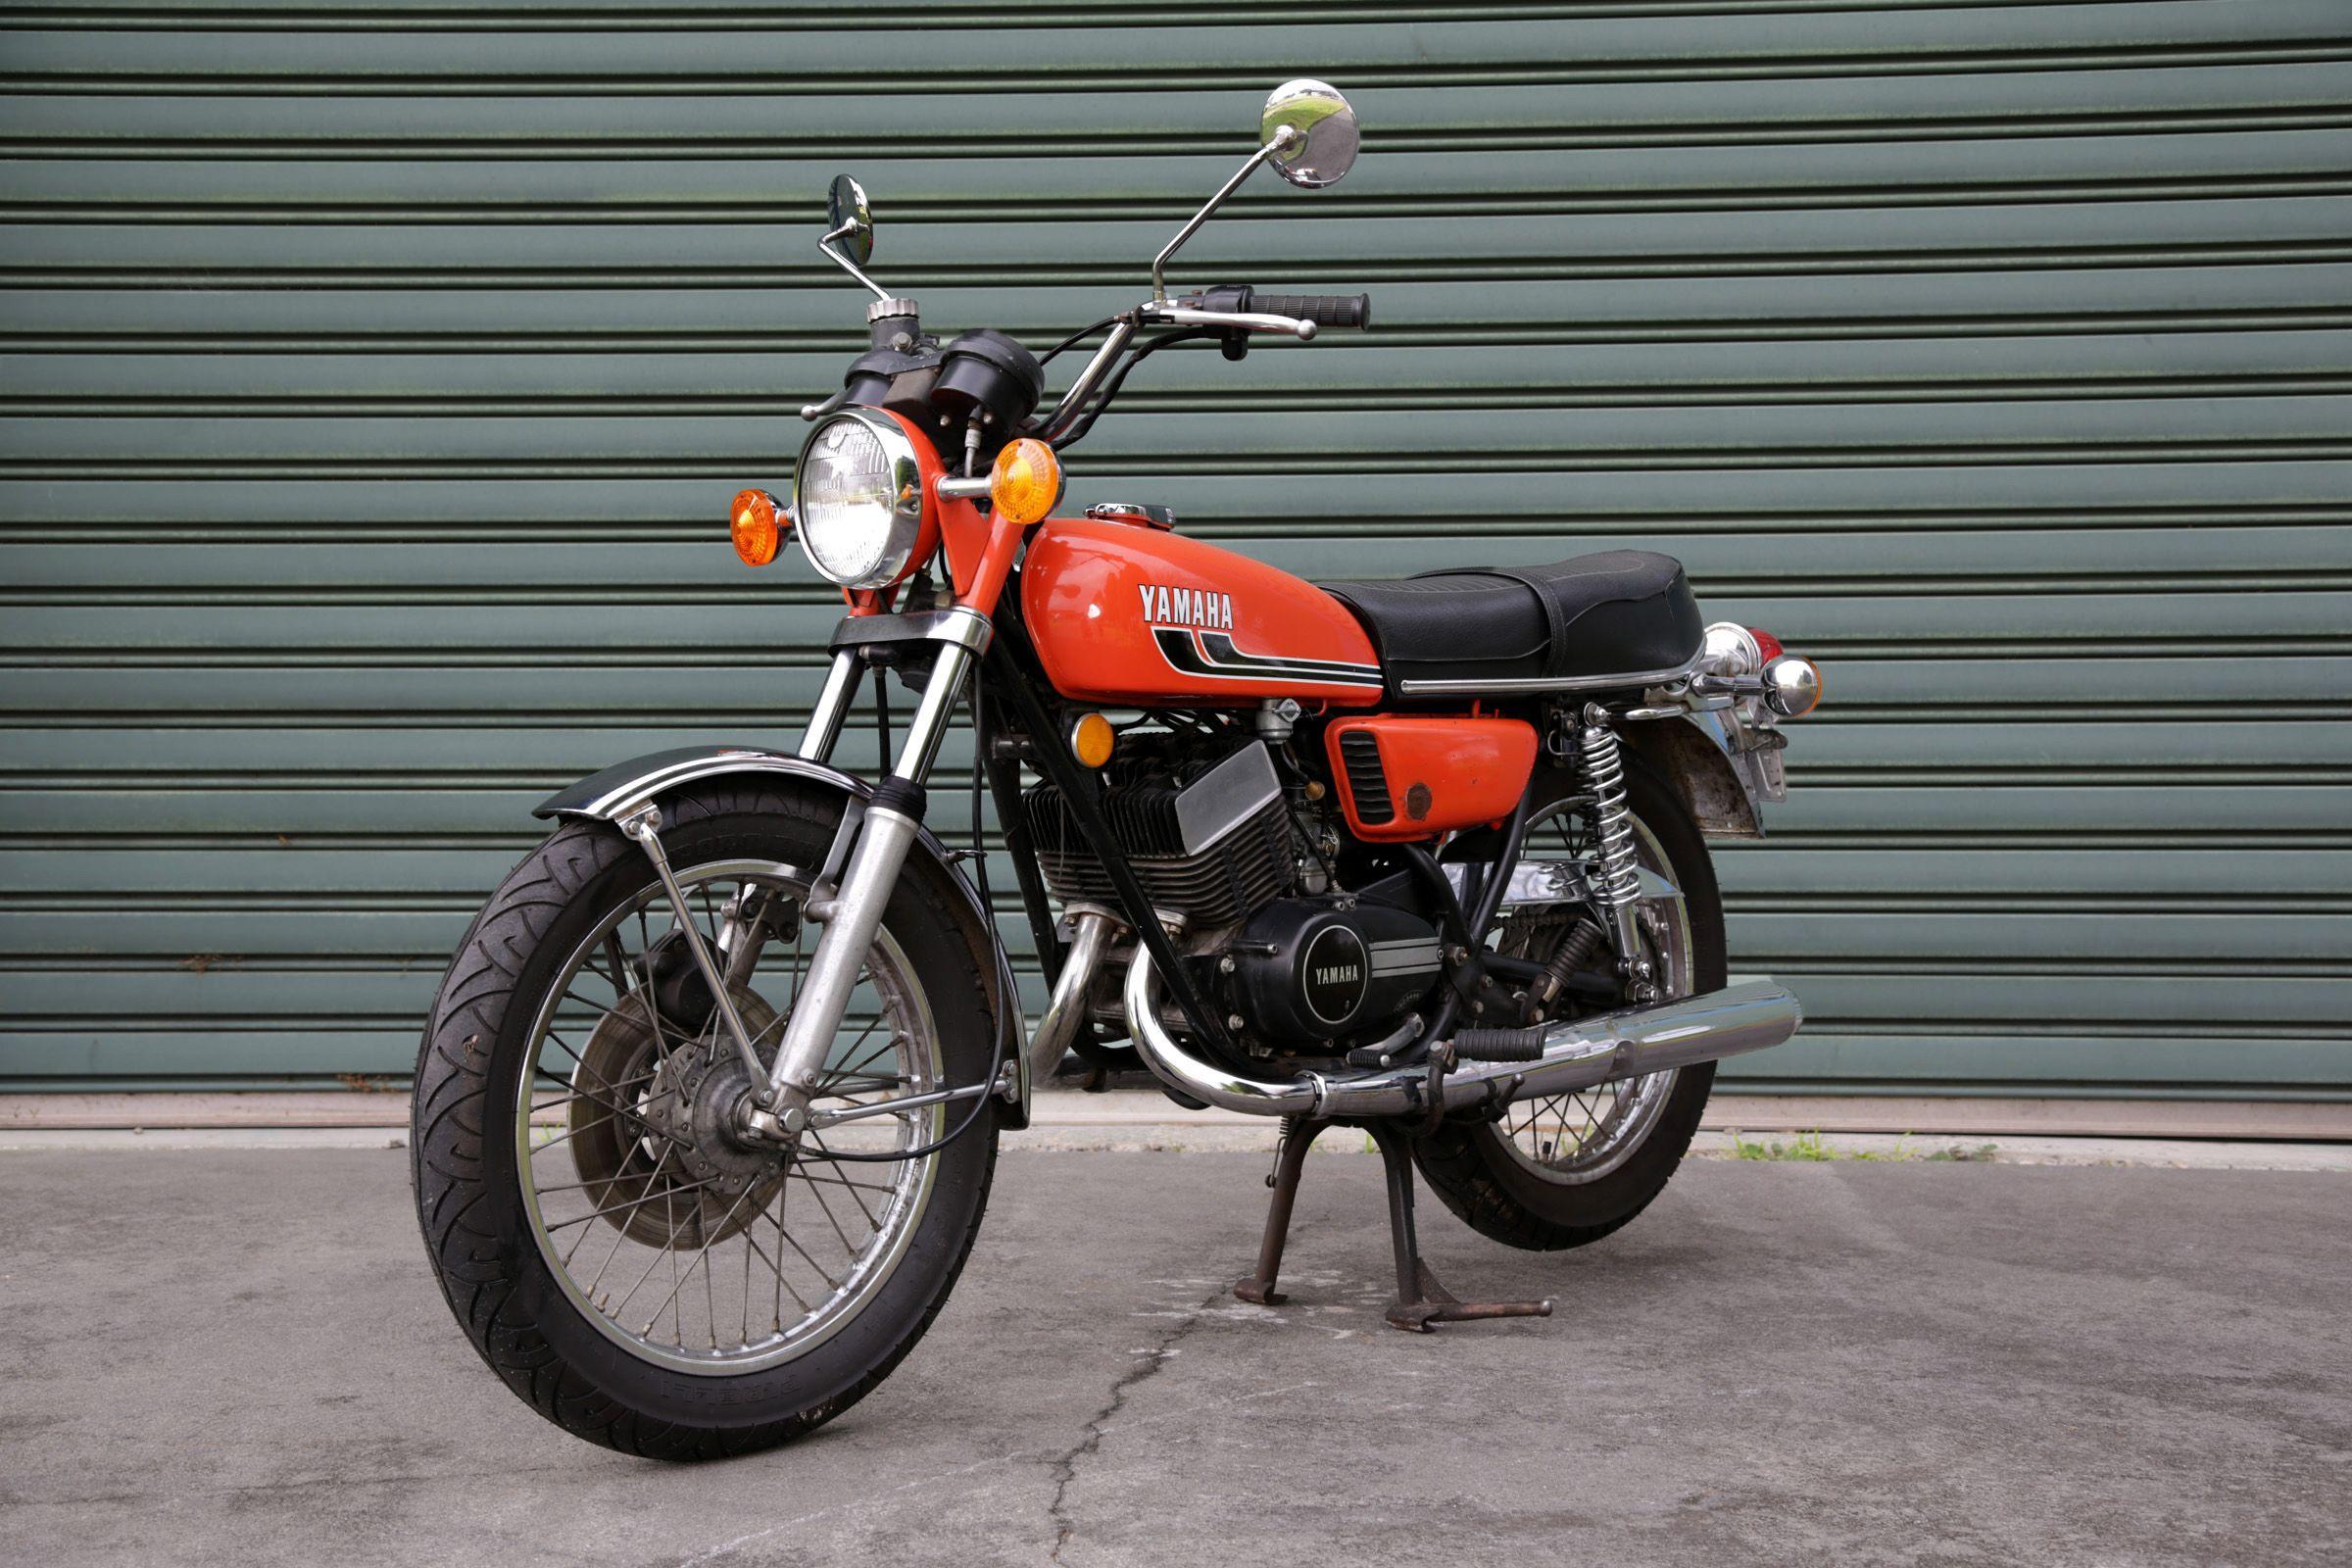 1975 Yamaha RD350 f45ls | RD 350 | Yamaha bikes, Antique